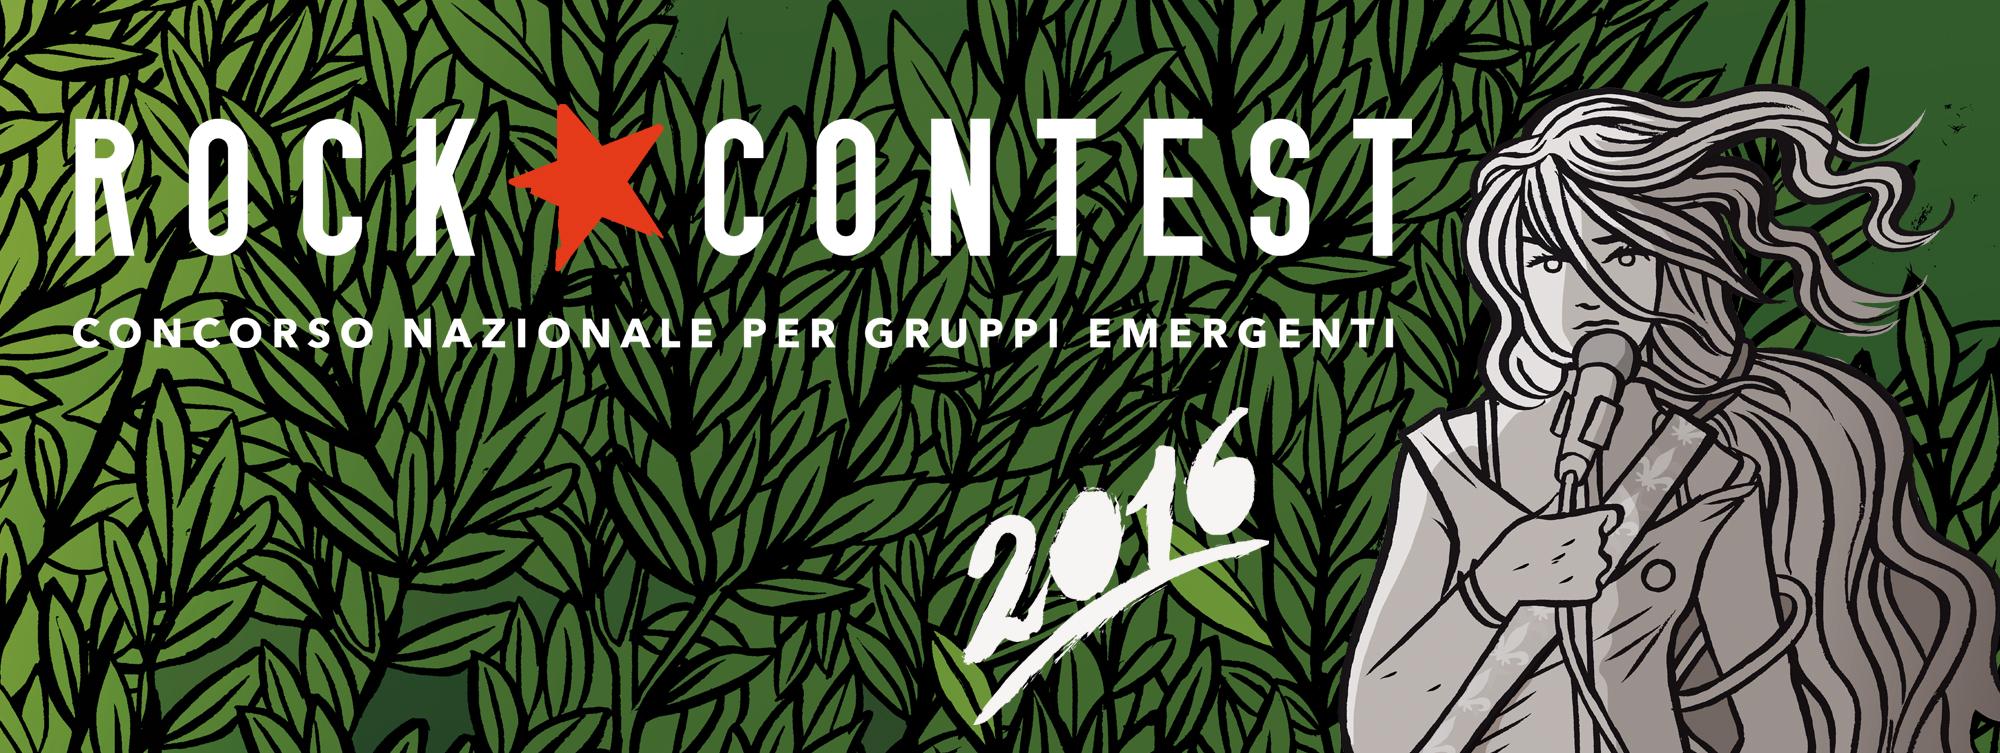 bannercontest2016